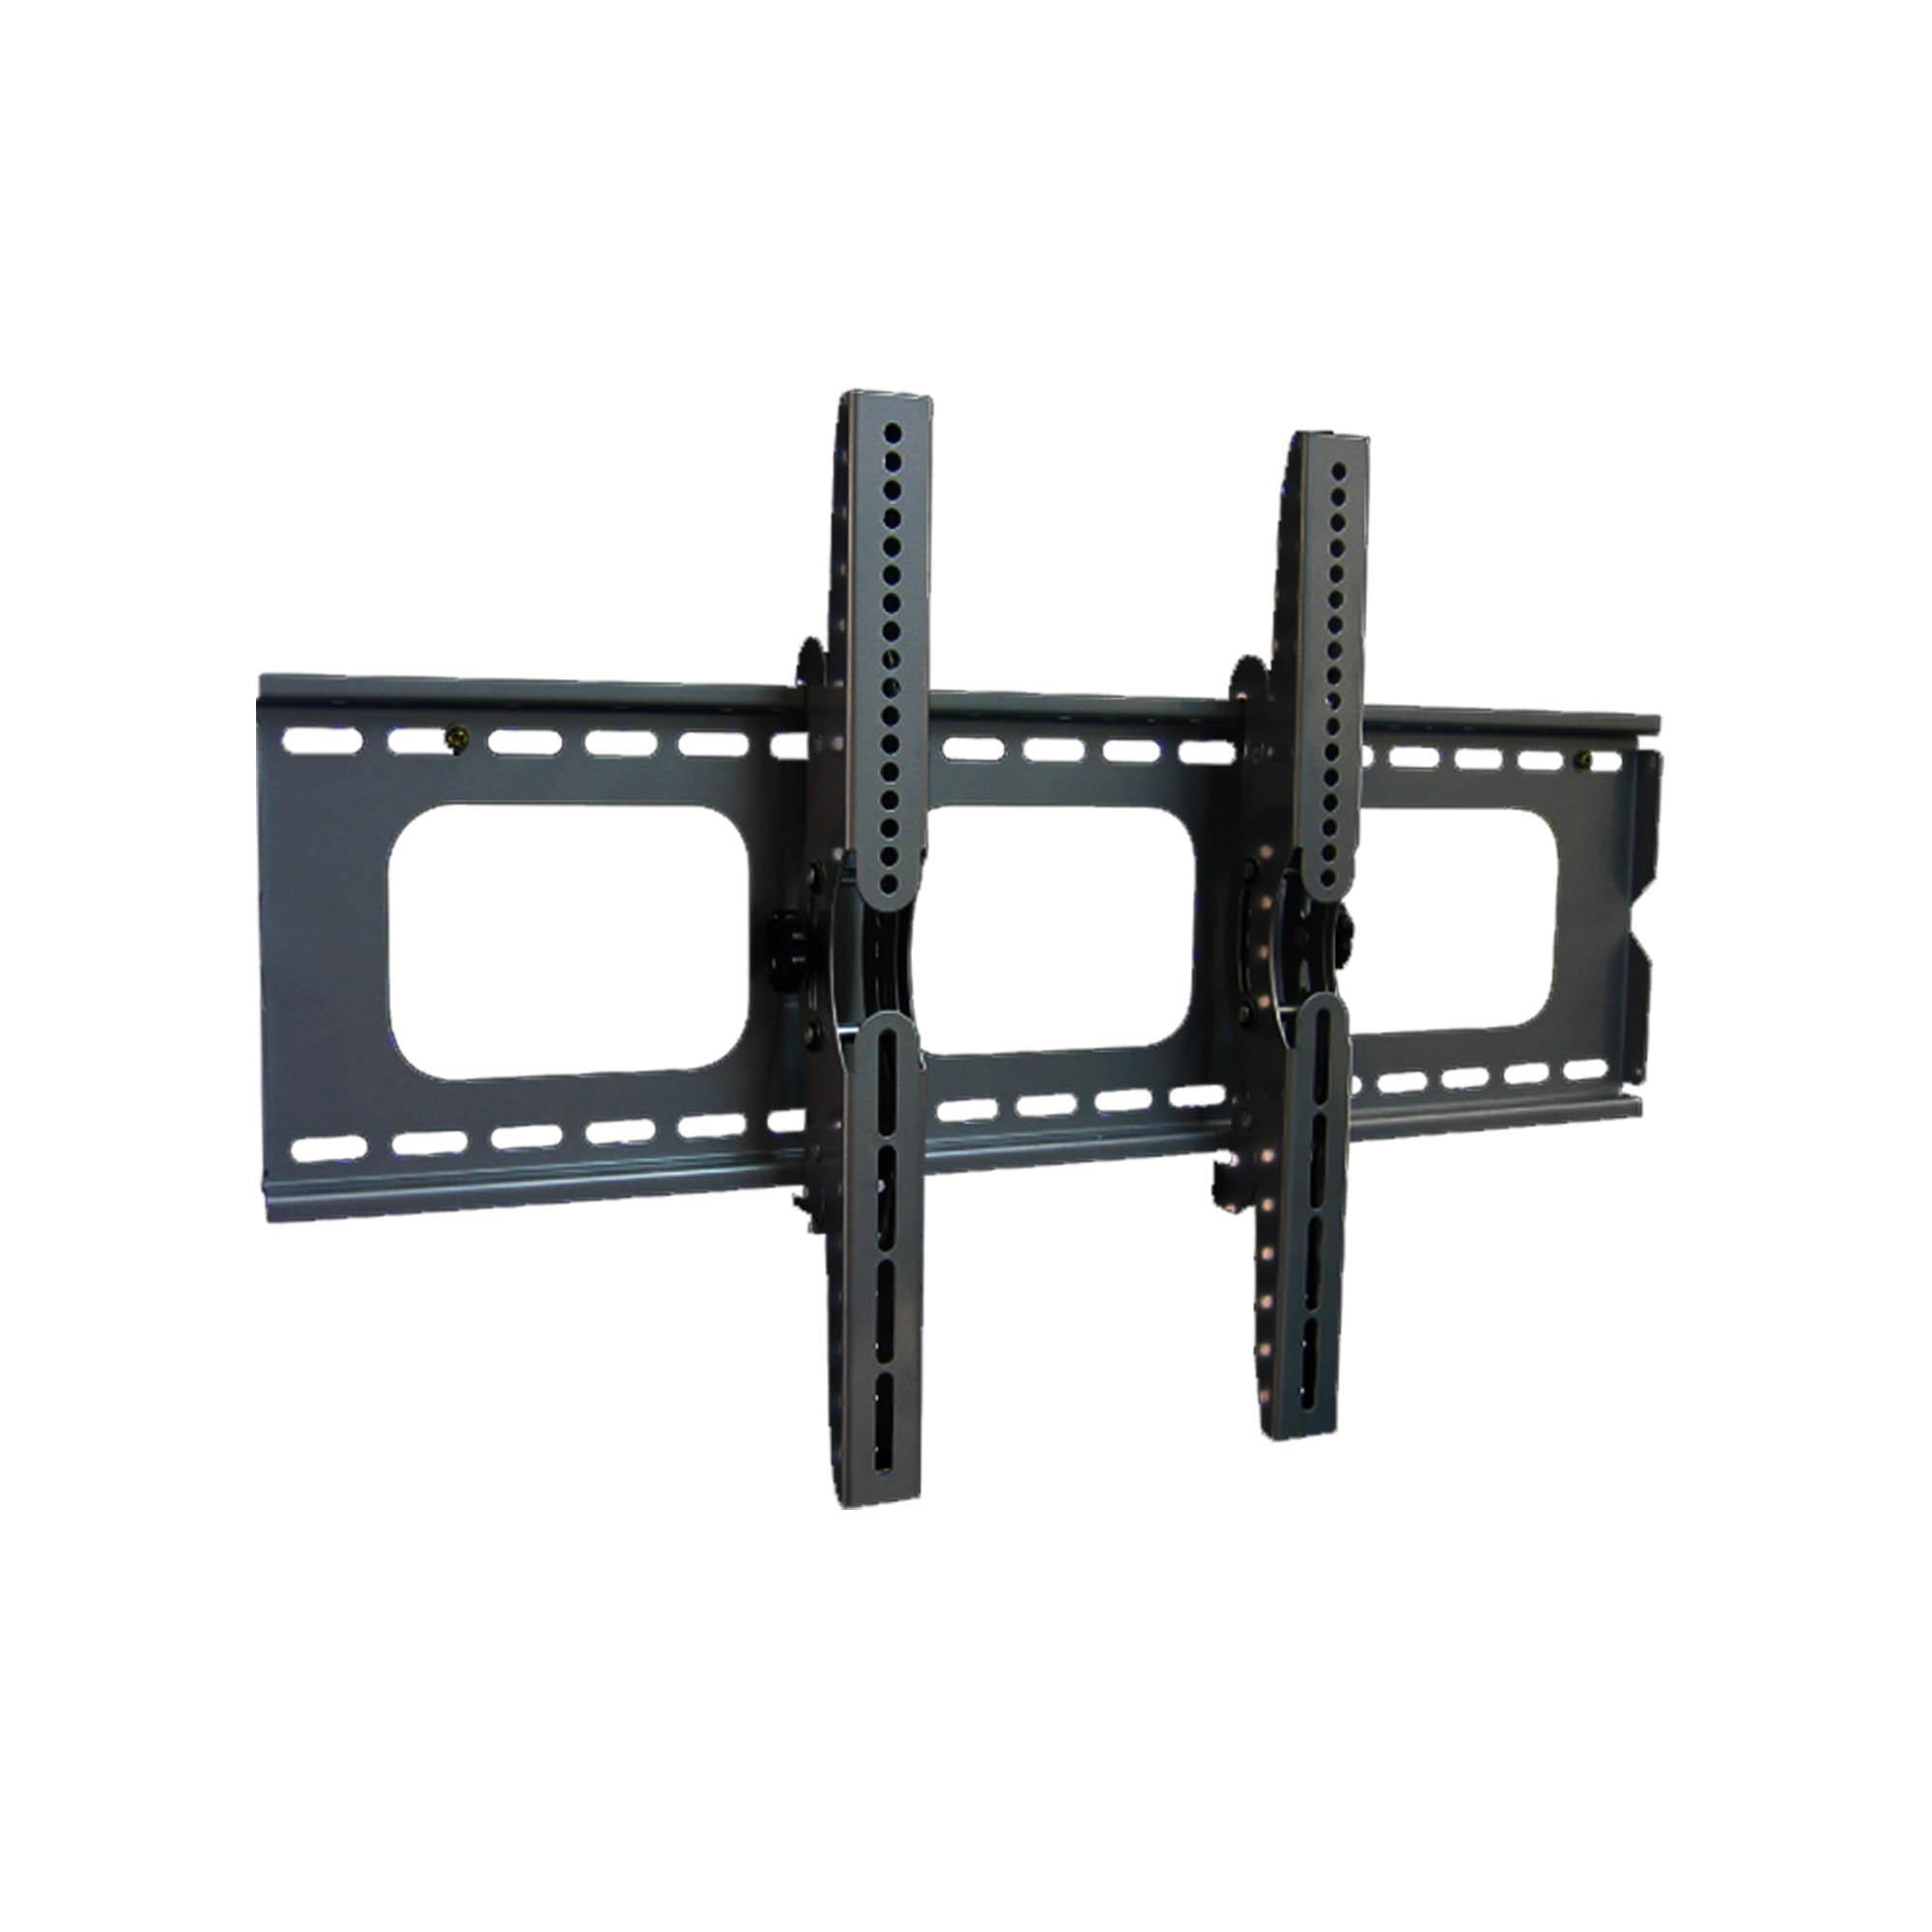 Universal LED TV Wall Mount Adjustable Bracket